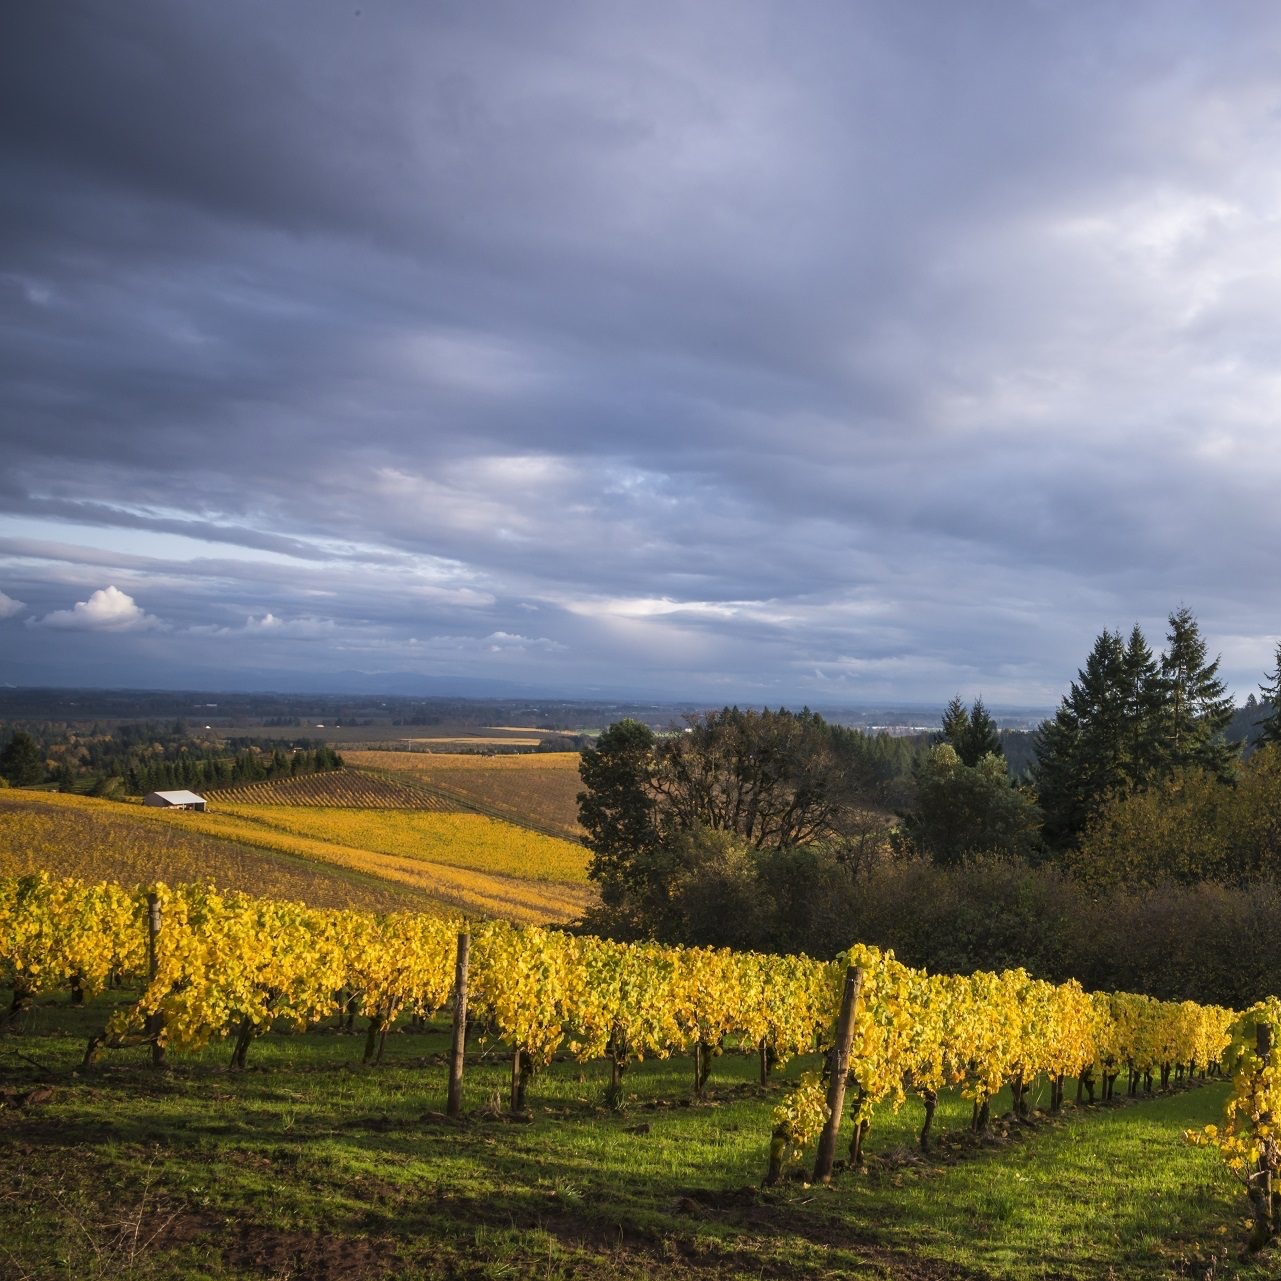 Domaine Loubejac Vineyard - Willamette Valley AVA, Oregon.